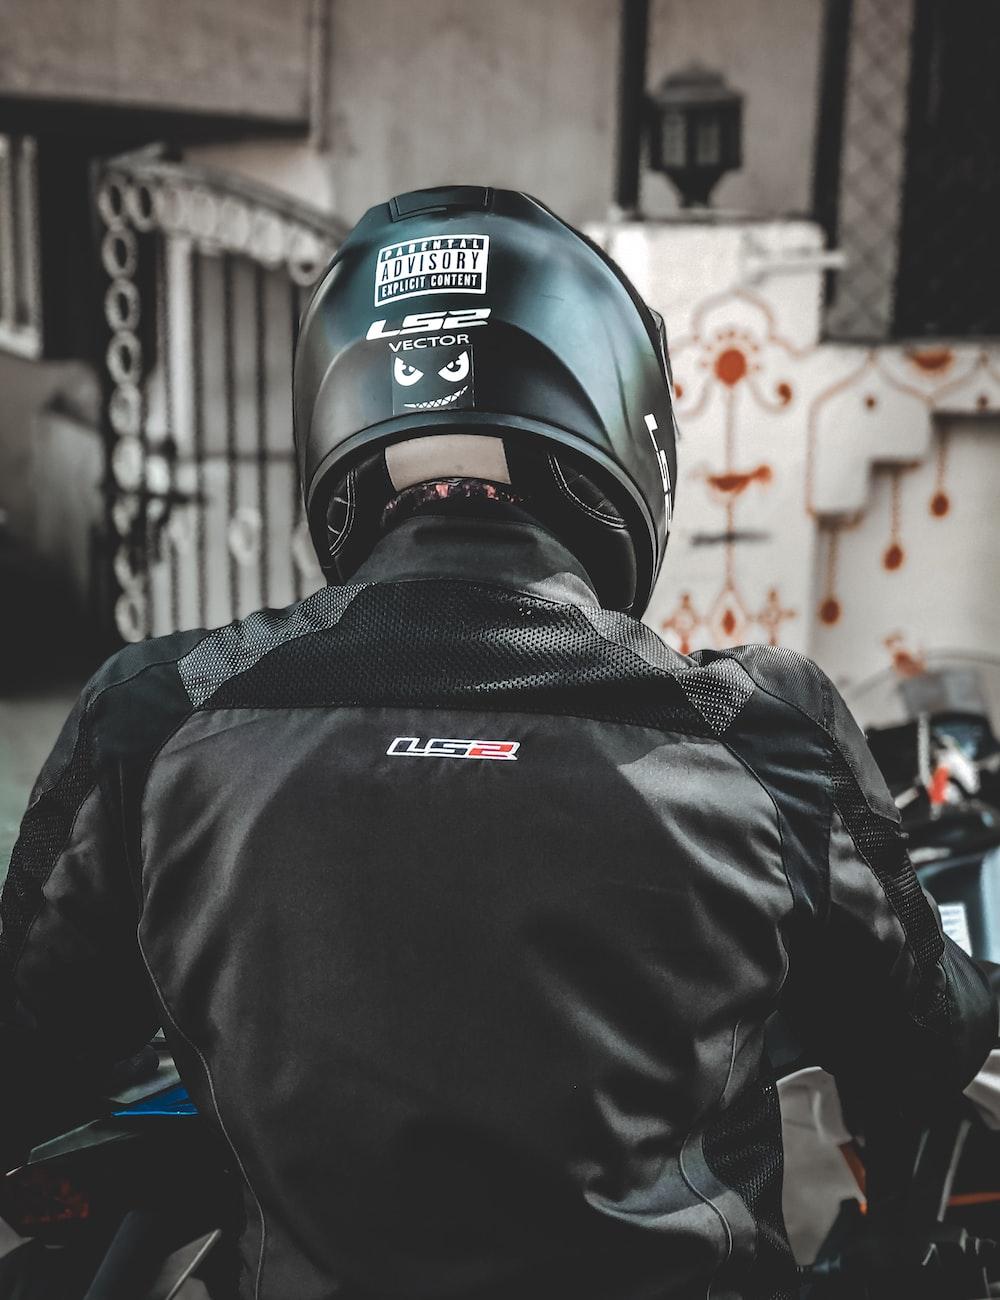 person wearing black jacket and helmet